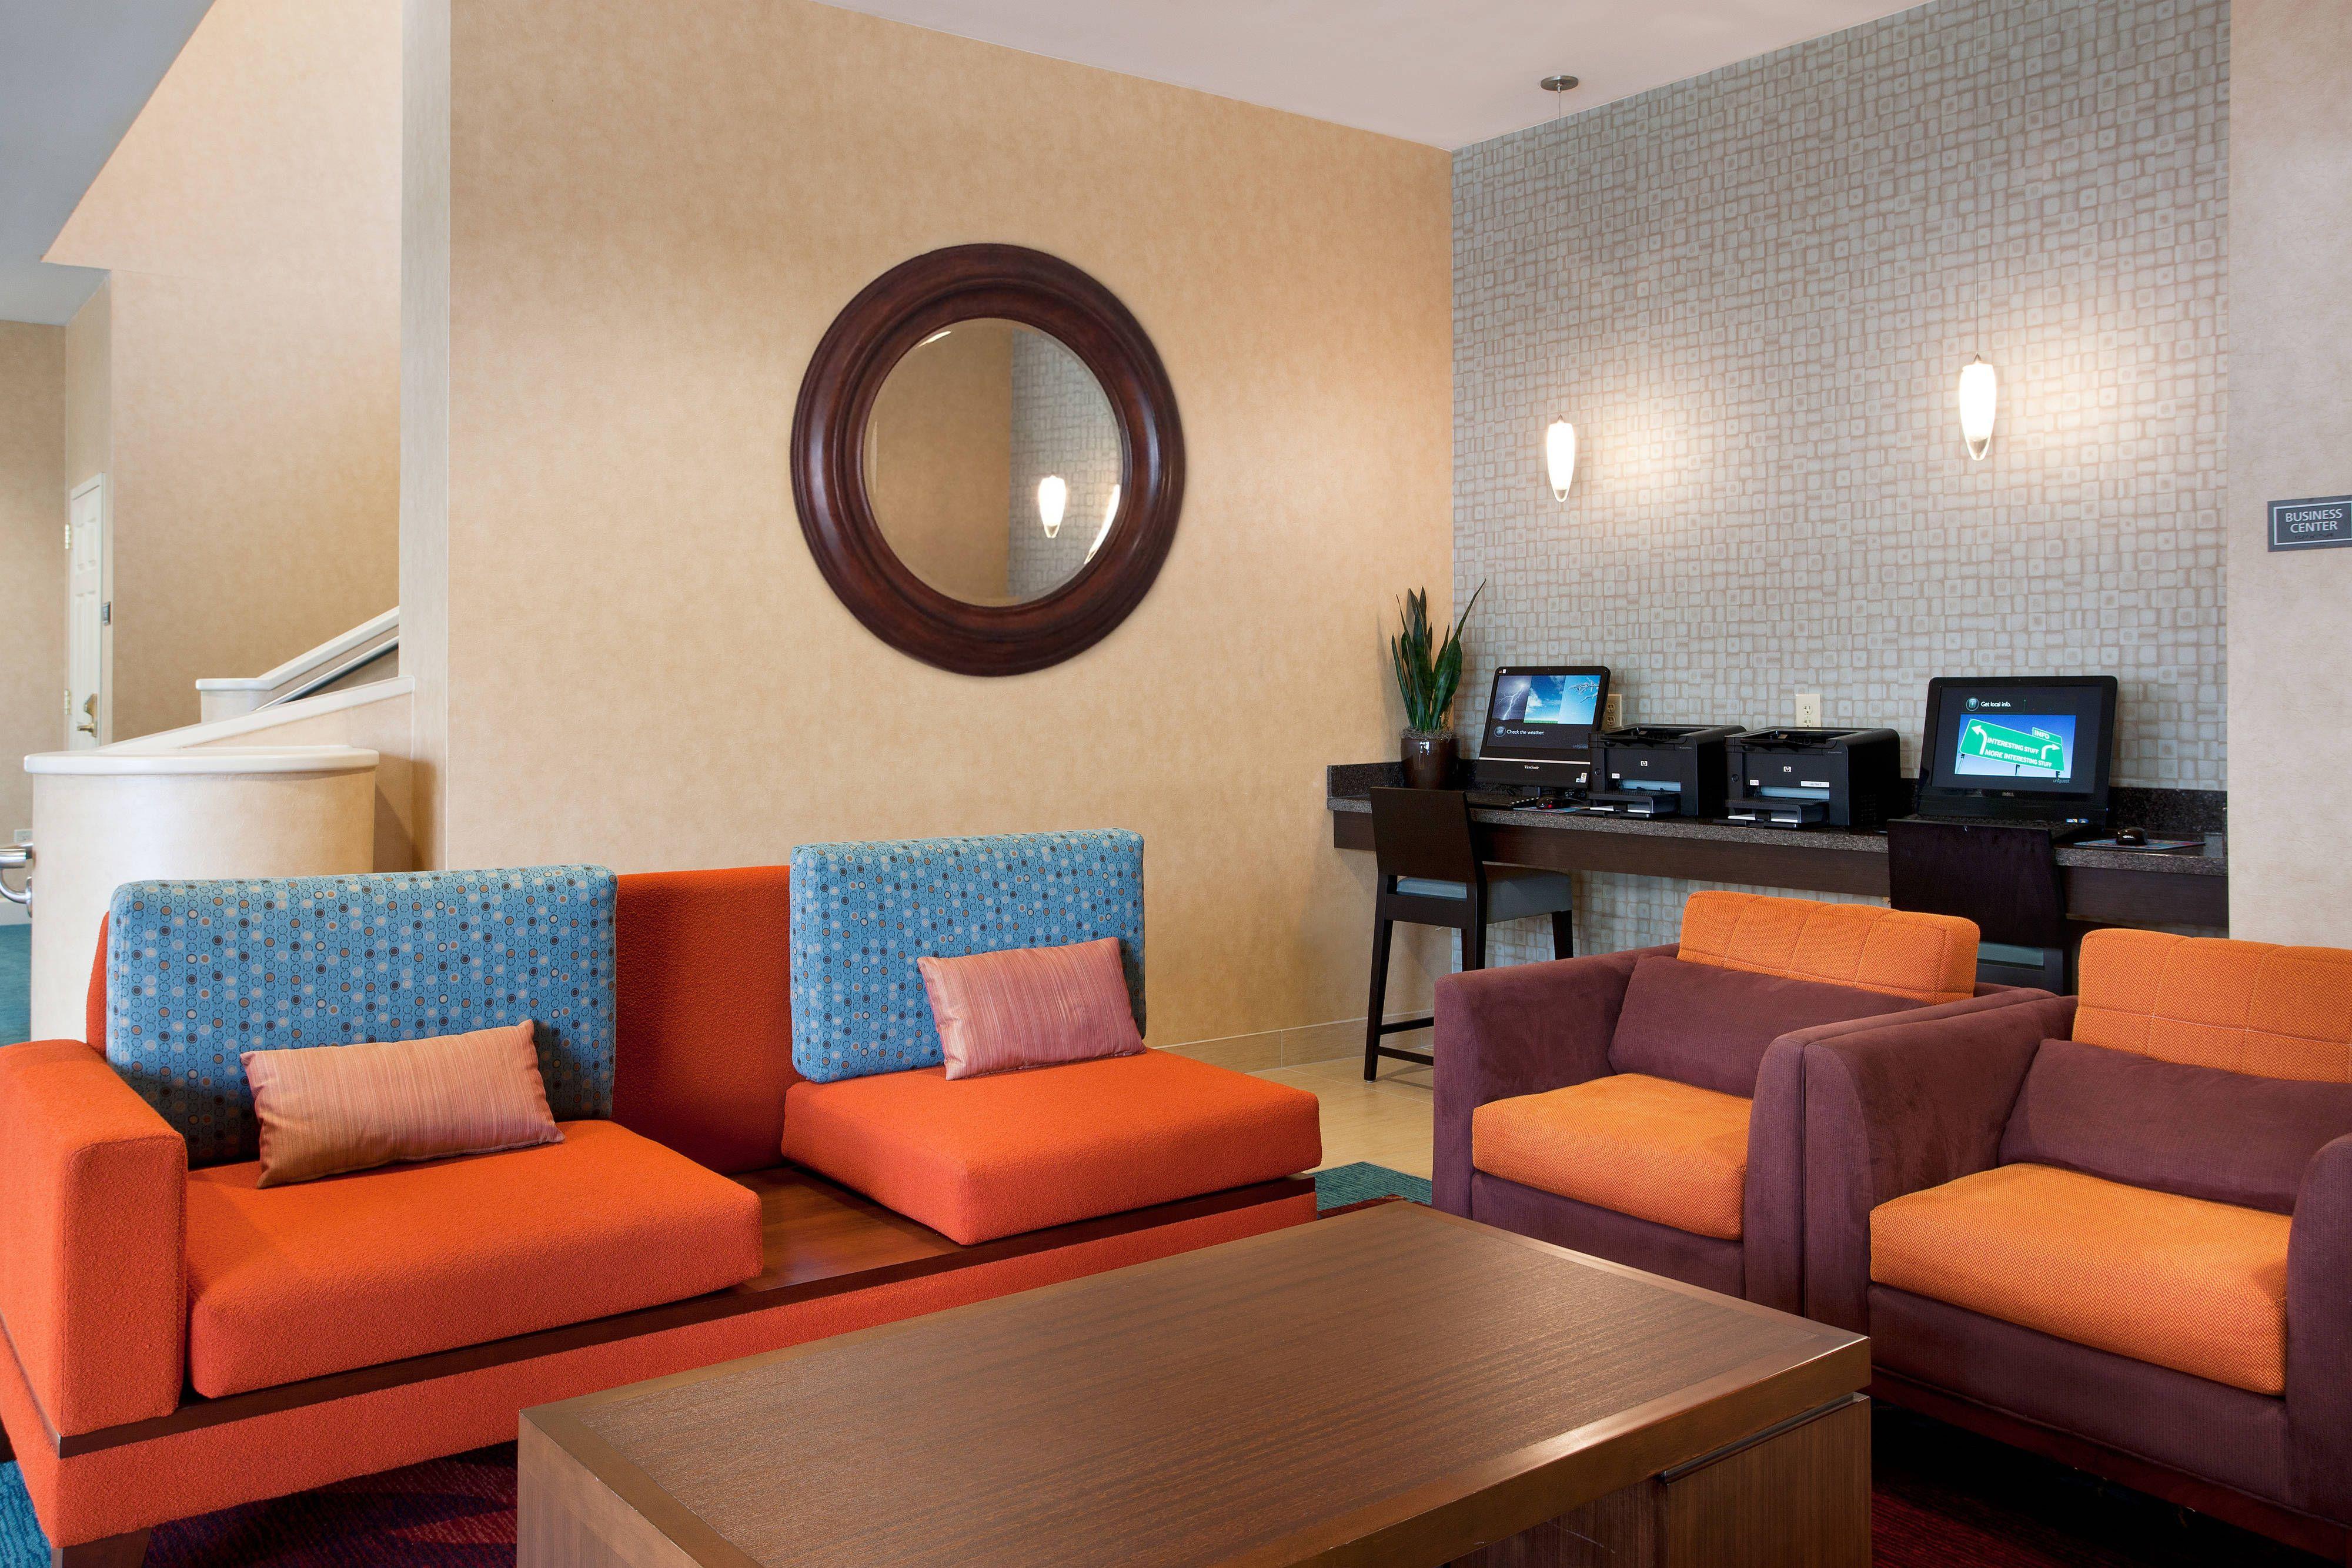 Residence Inn San Antonio Downtown Alamo Plaza Lobby Hotel Guestbathroom Comfort